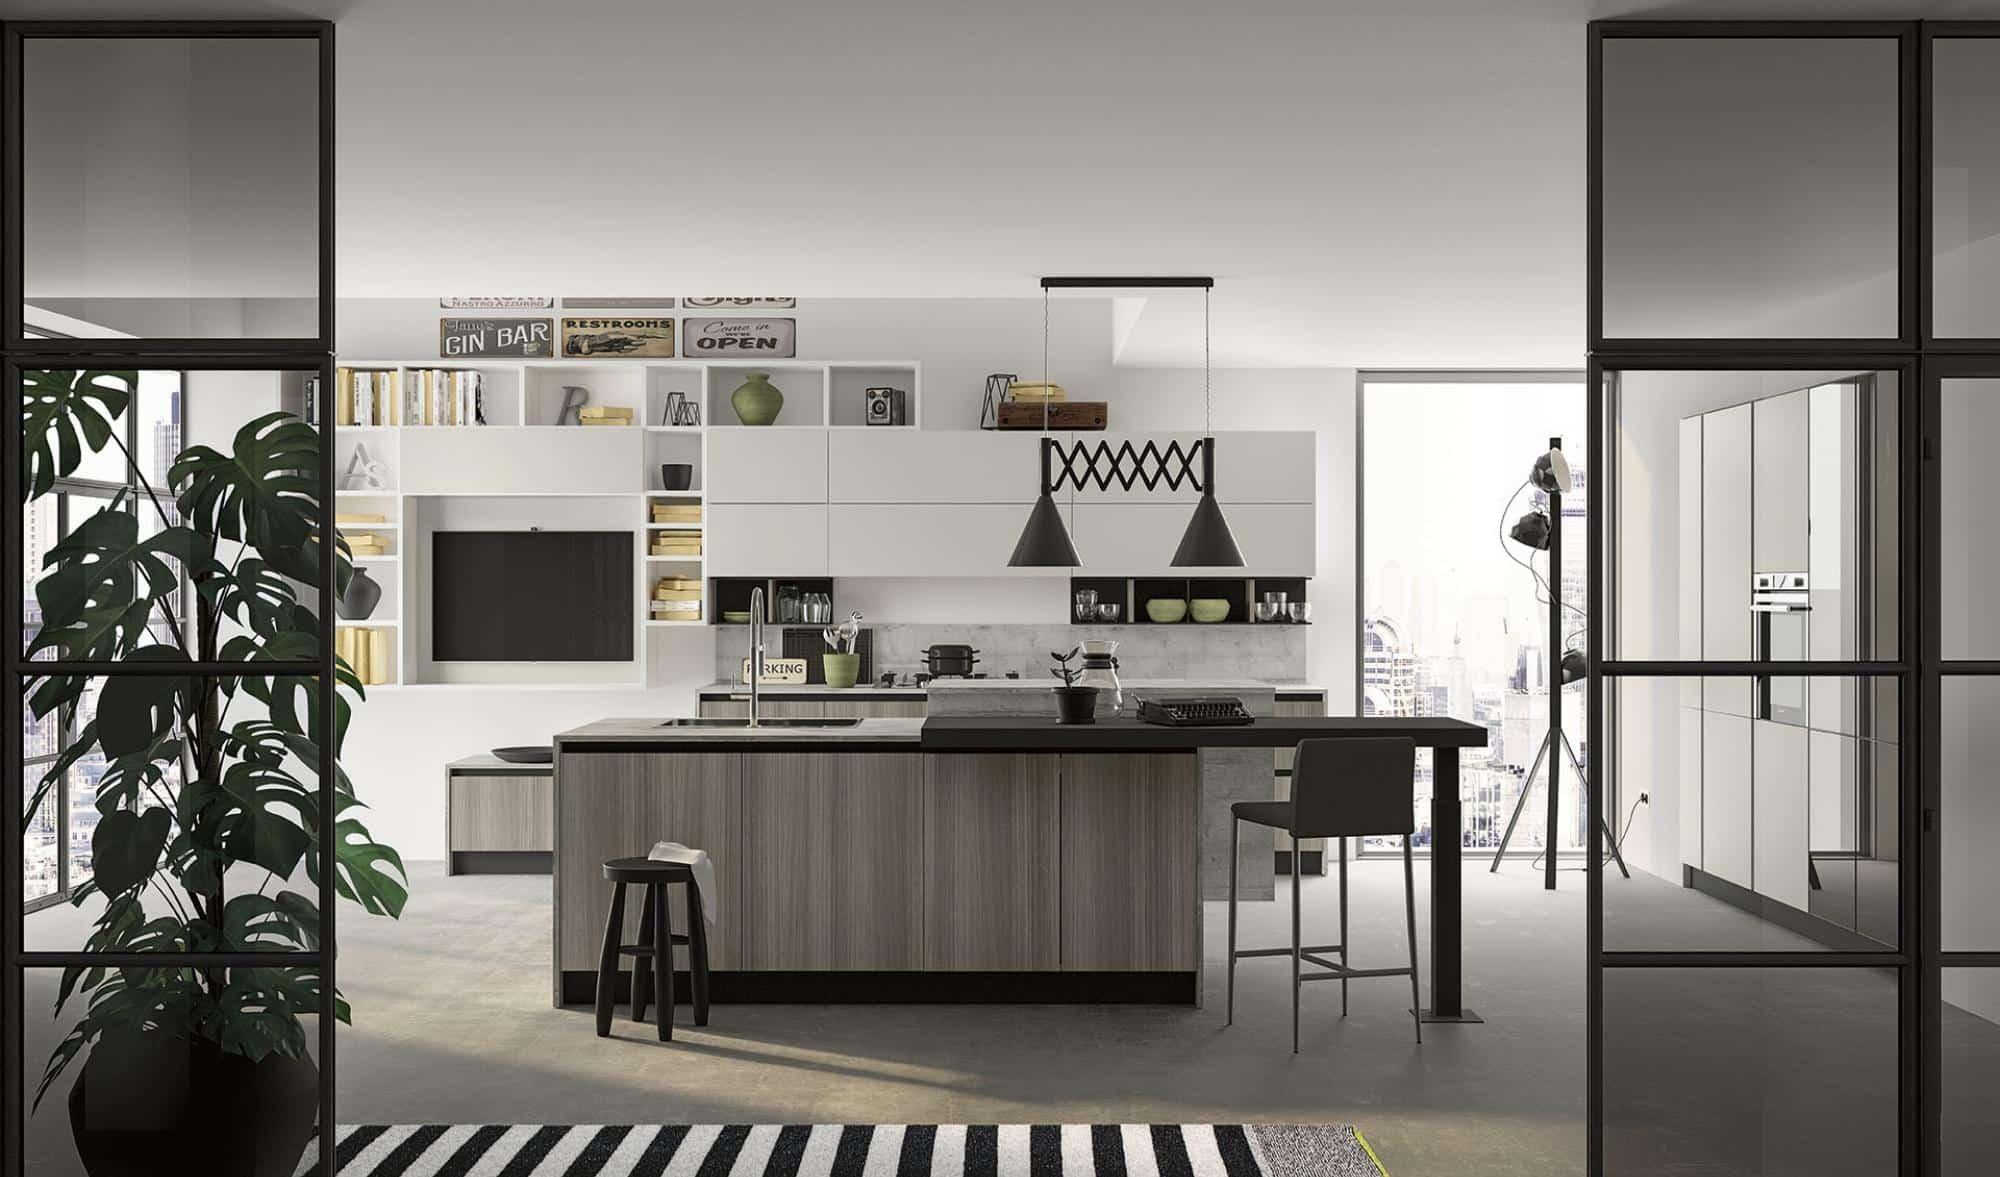 Lungomare κουζινα χωρις πομολο με υφη γκρι ξυλου και λευκη ματ λακα